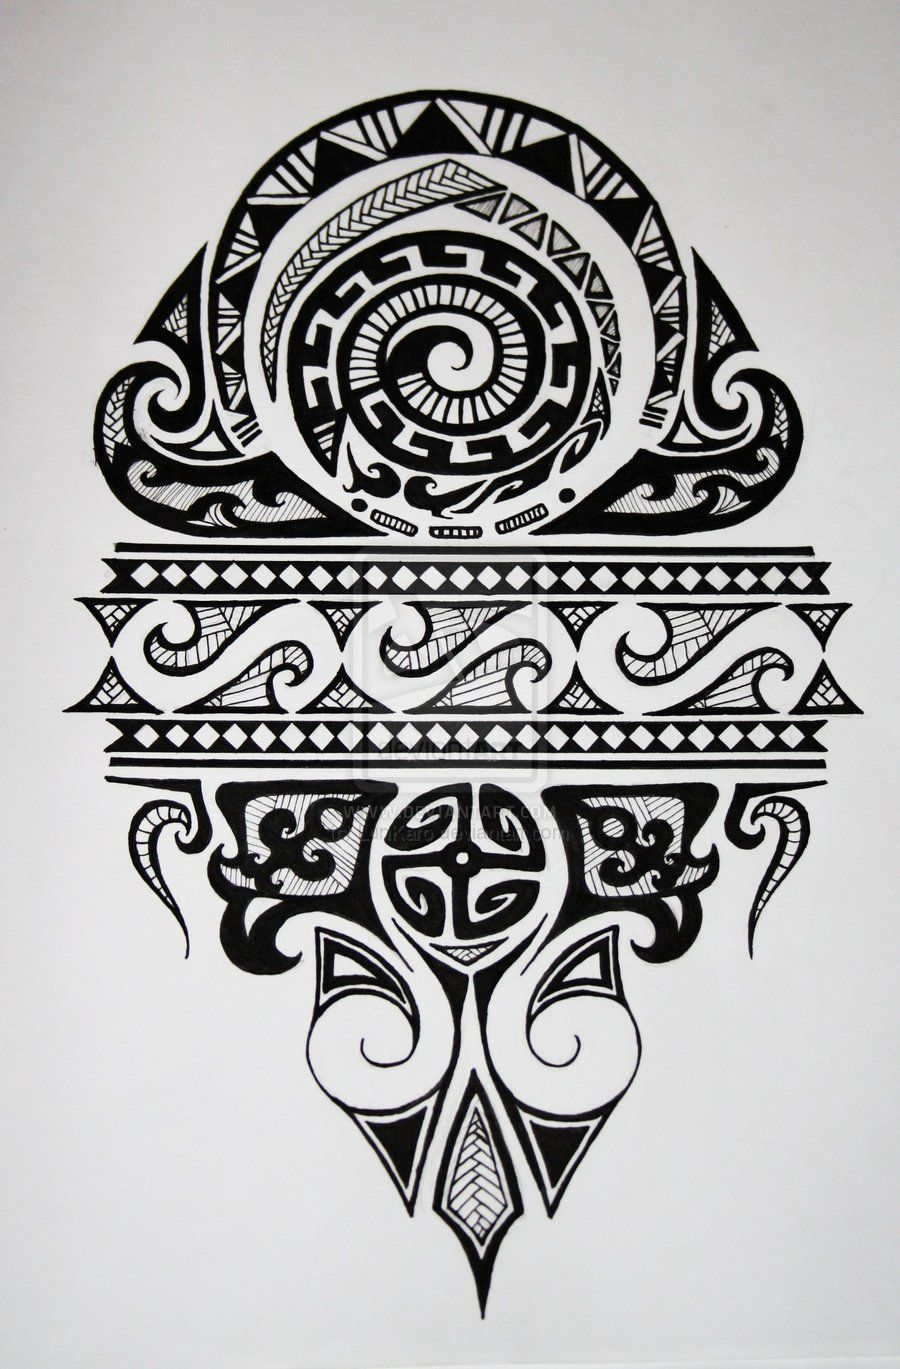 Maori-by-lunkaro-designs-interfaces-tattoo-design-2010